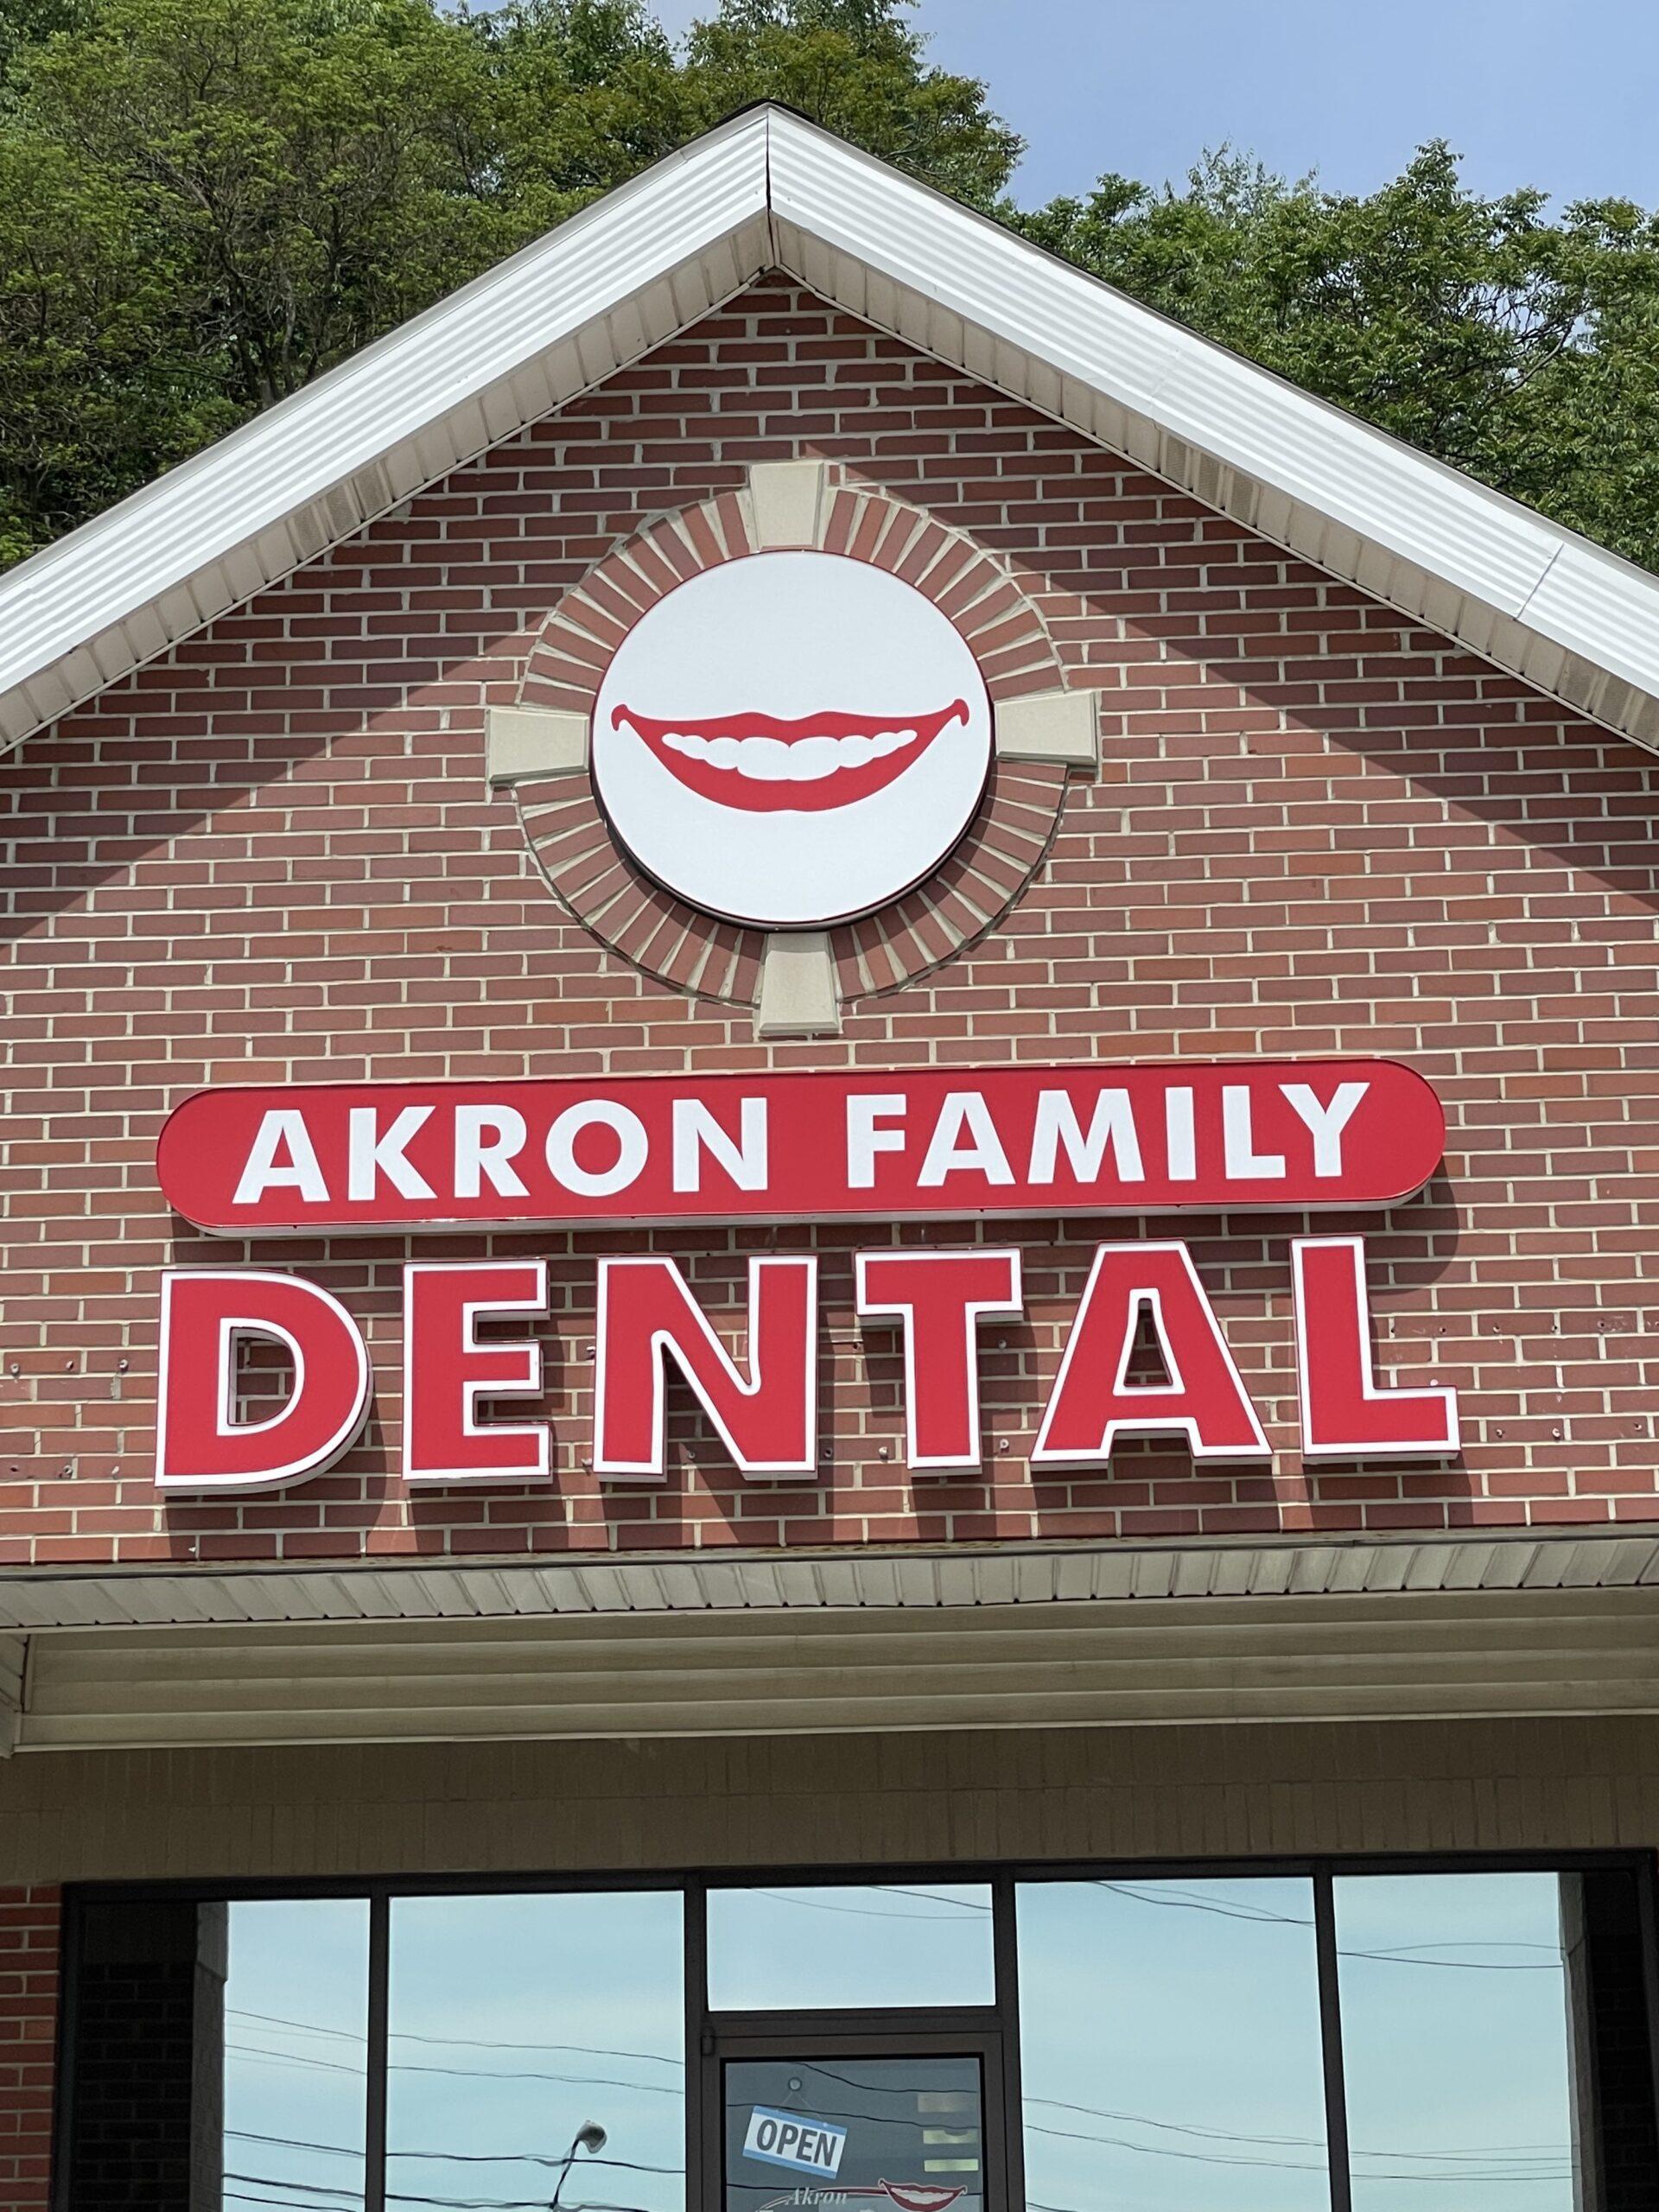 Akron Family Dental, Front view